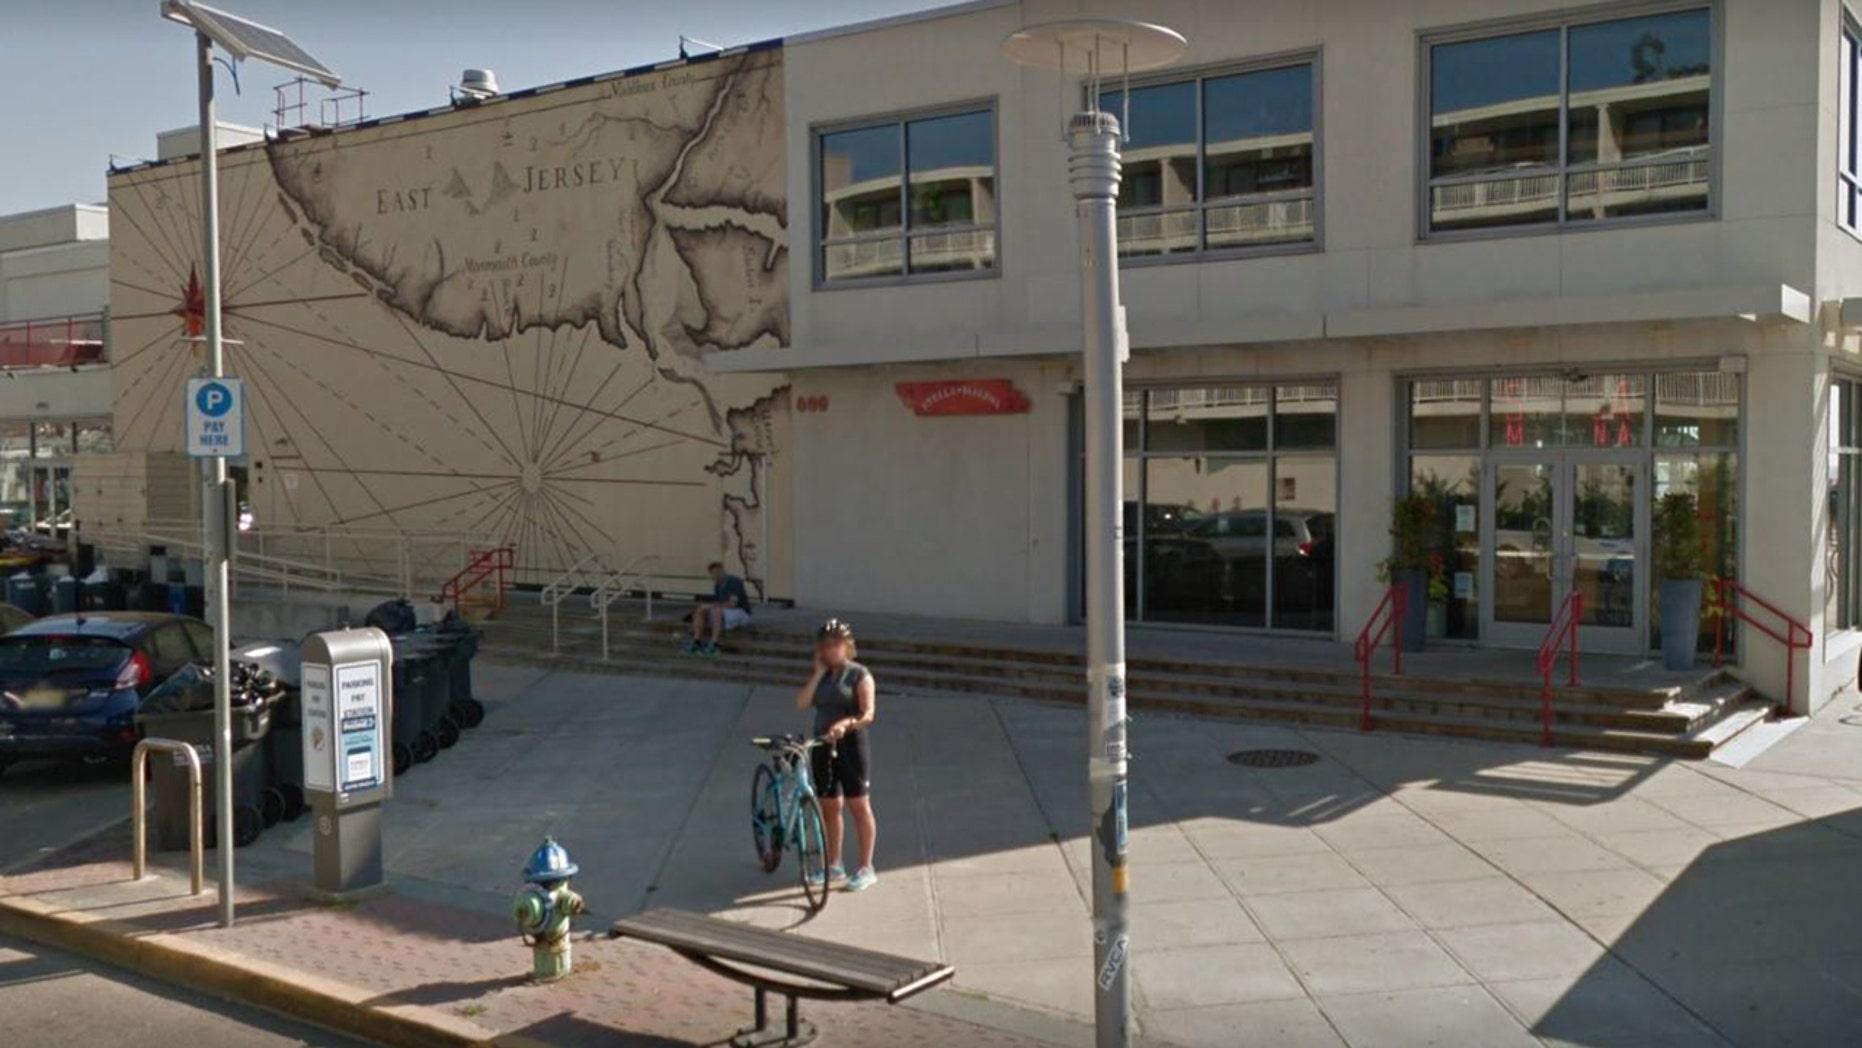 Outside Stella Marina Bar & Restaurant in Asbury Park, N.J.